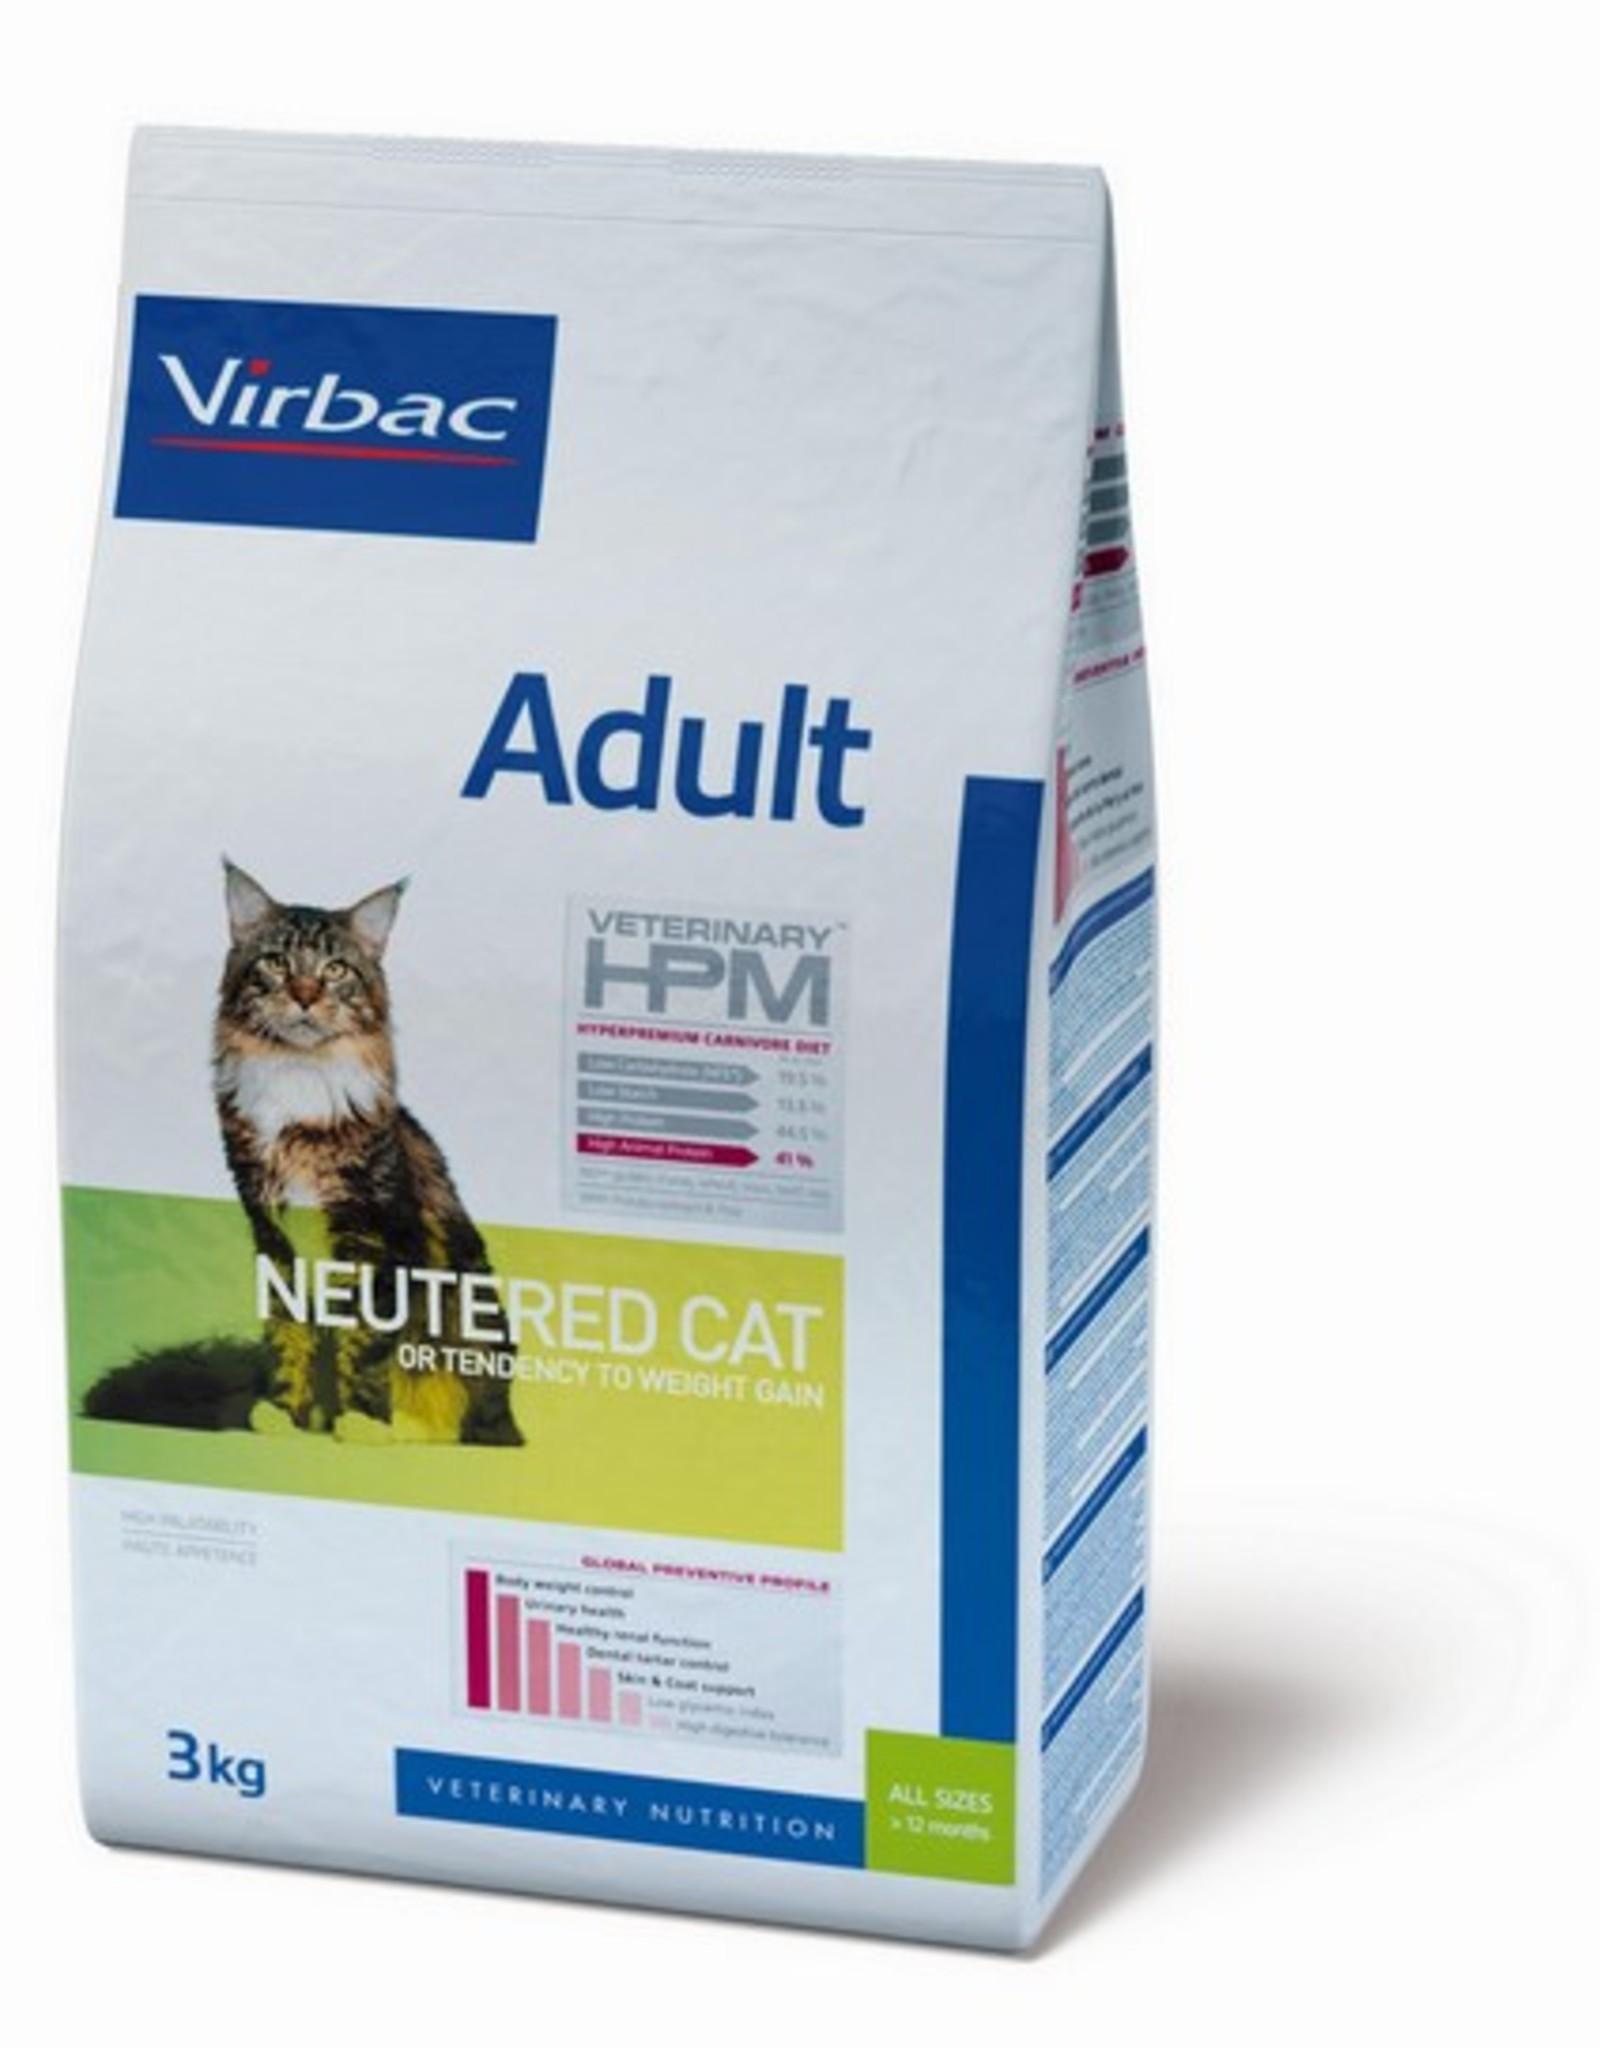 Virbac Virbac Hpm Kat Neutered Adult 3kg